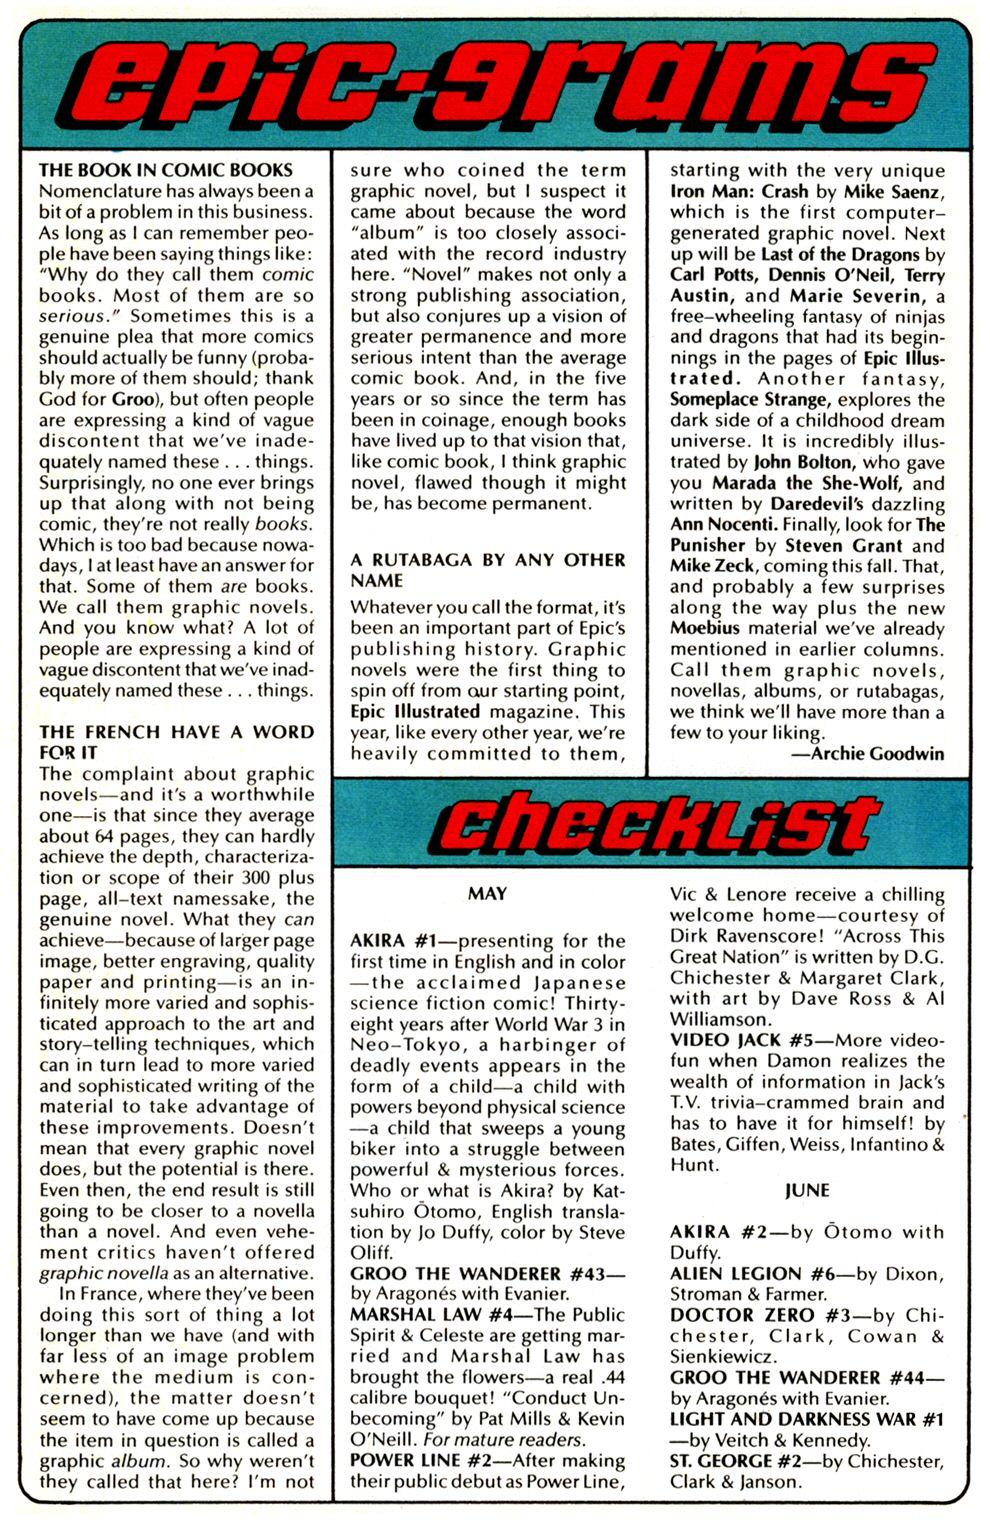 Read online Powerline comic -  Issue #2 - 31